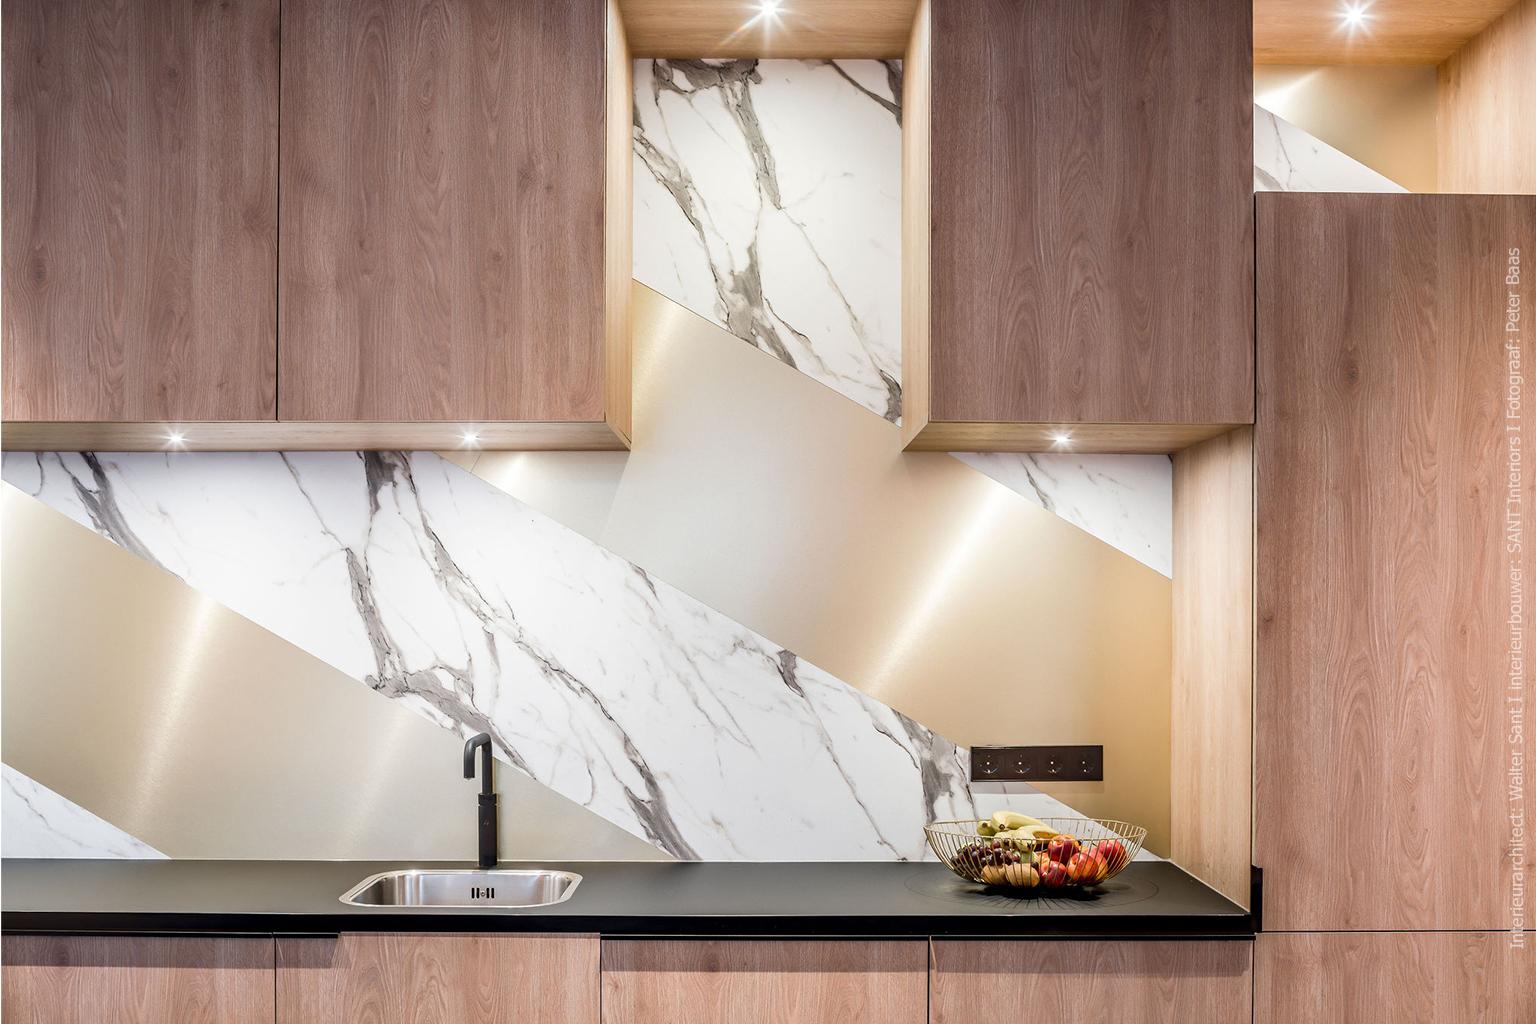 Keuken in FB38 Talco